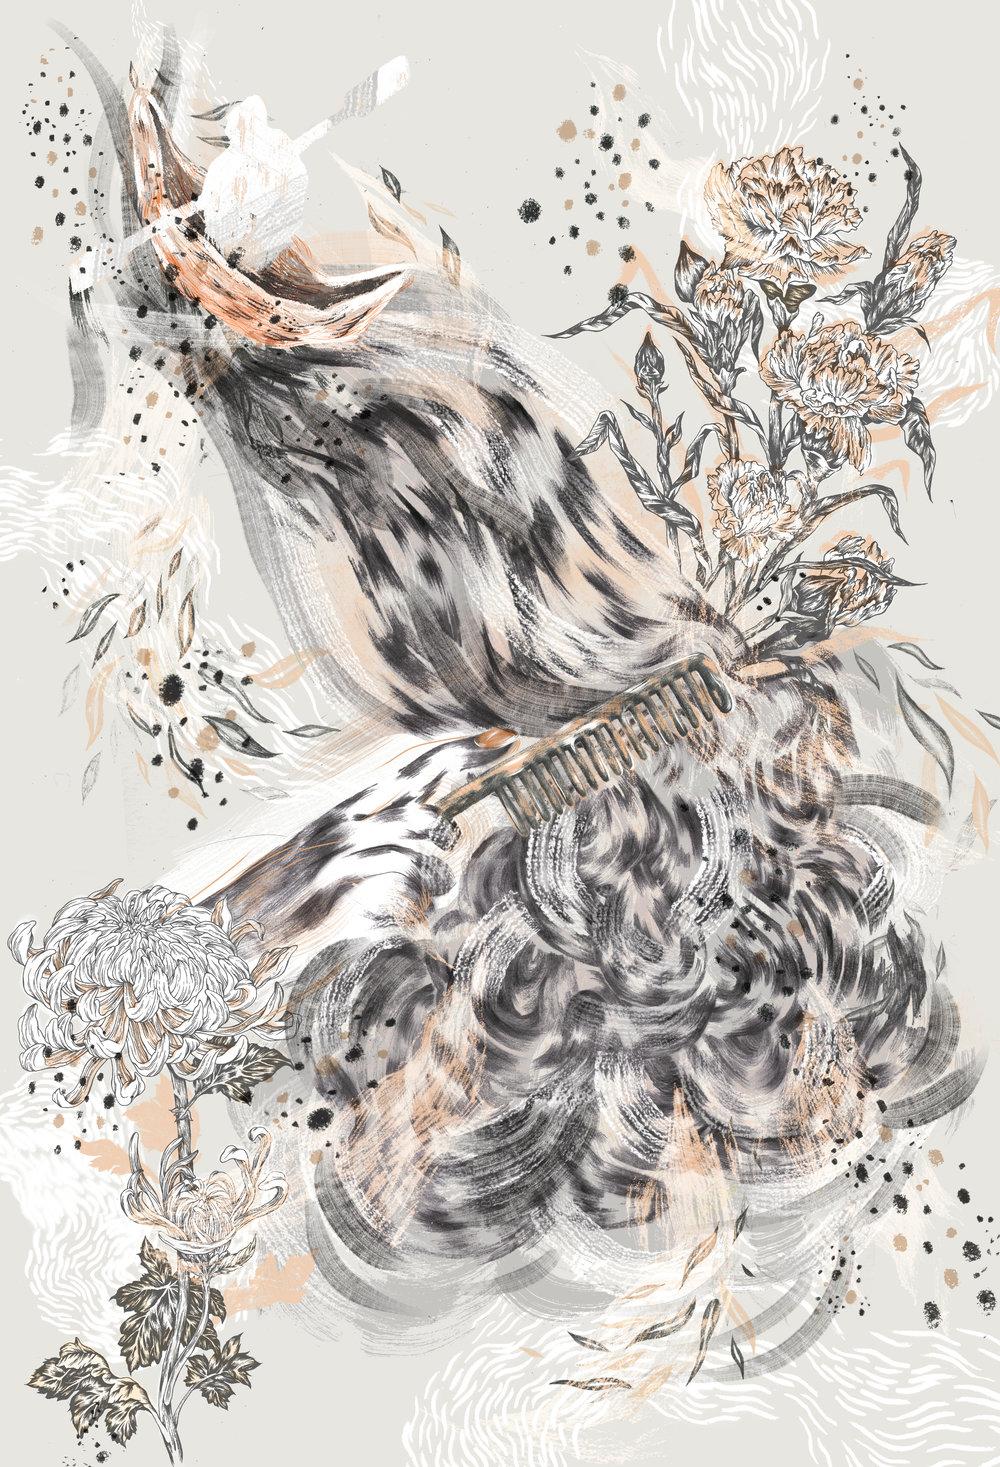 Rachel Wada - Making Time - Resized.jpg